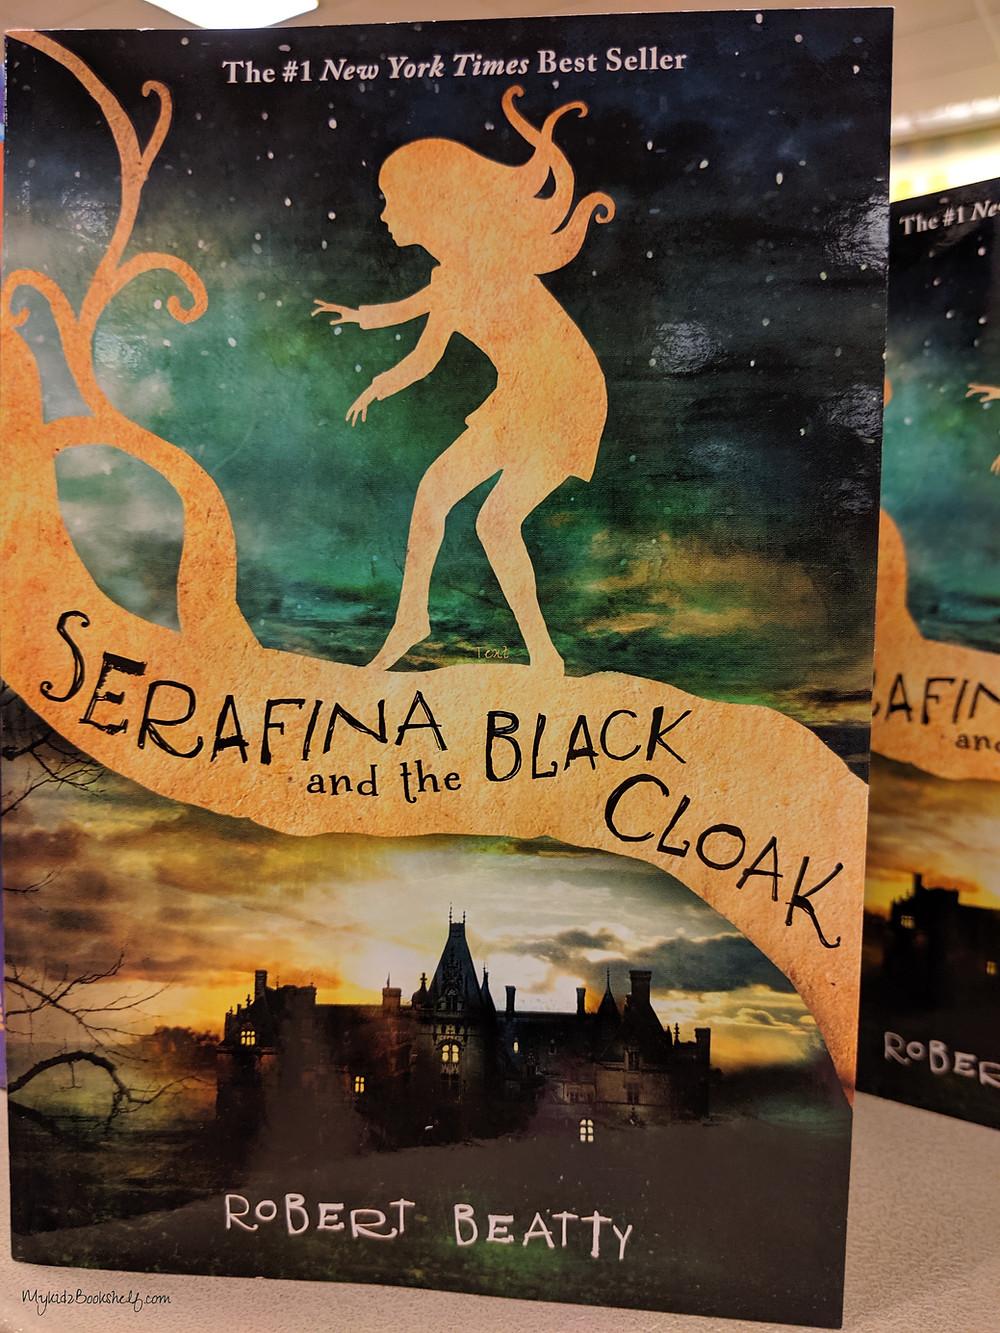 Serafina-and-the-Black-Cloak-by-Robert-Beatty-book-one-Serafina-Series